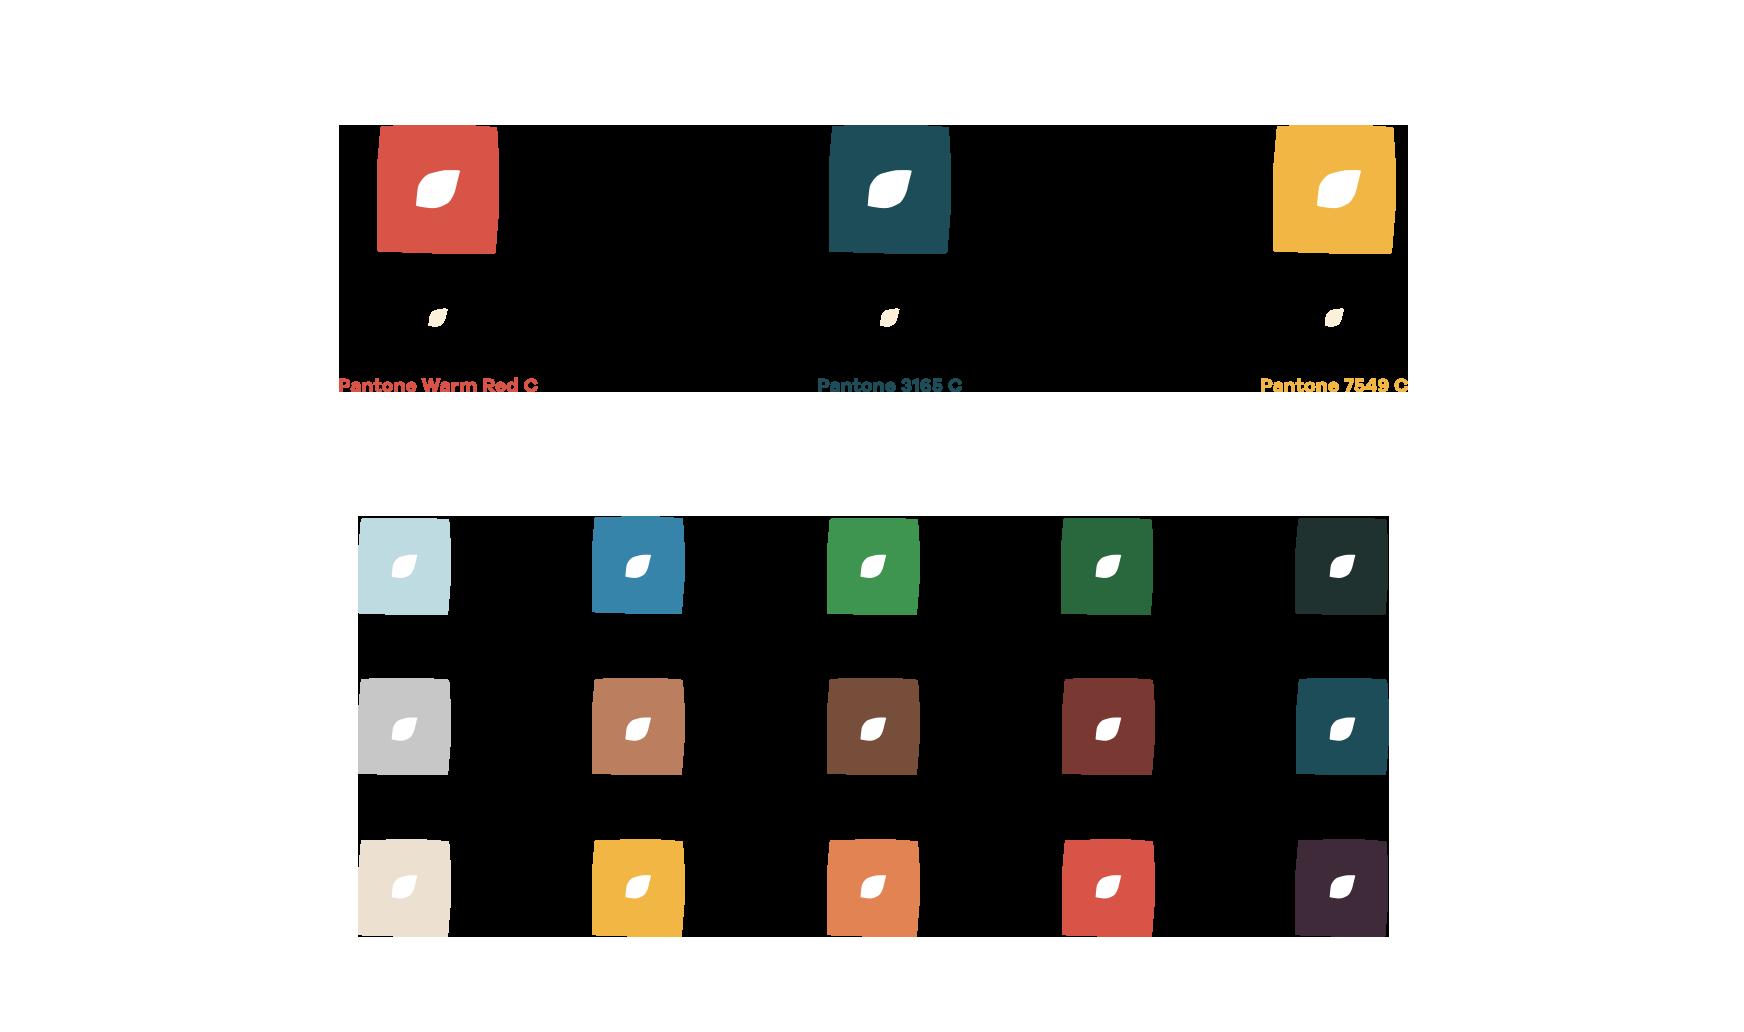 Dejbox-couleurs